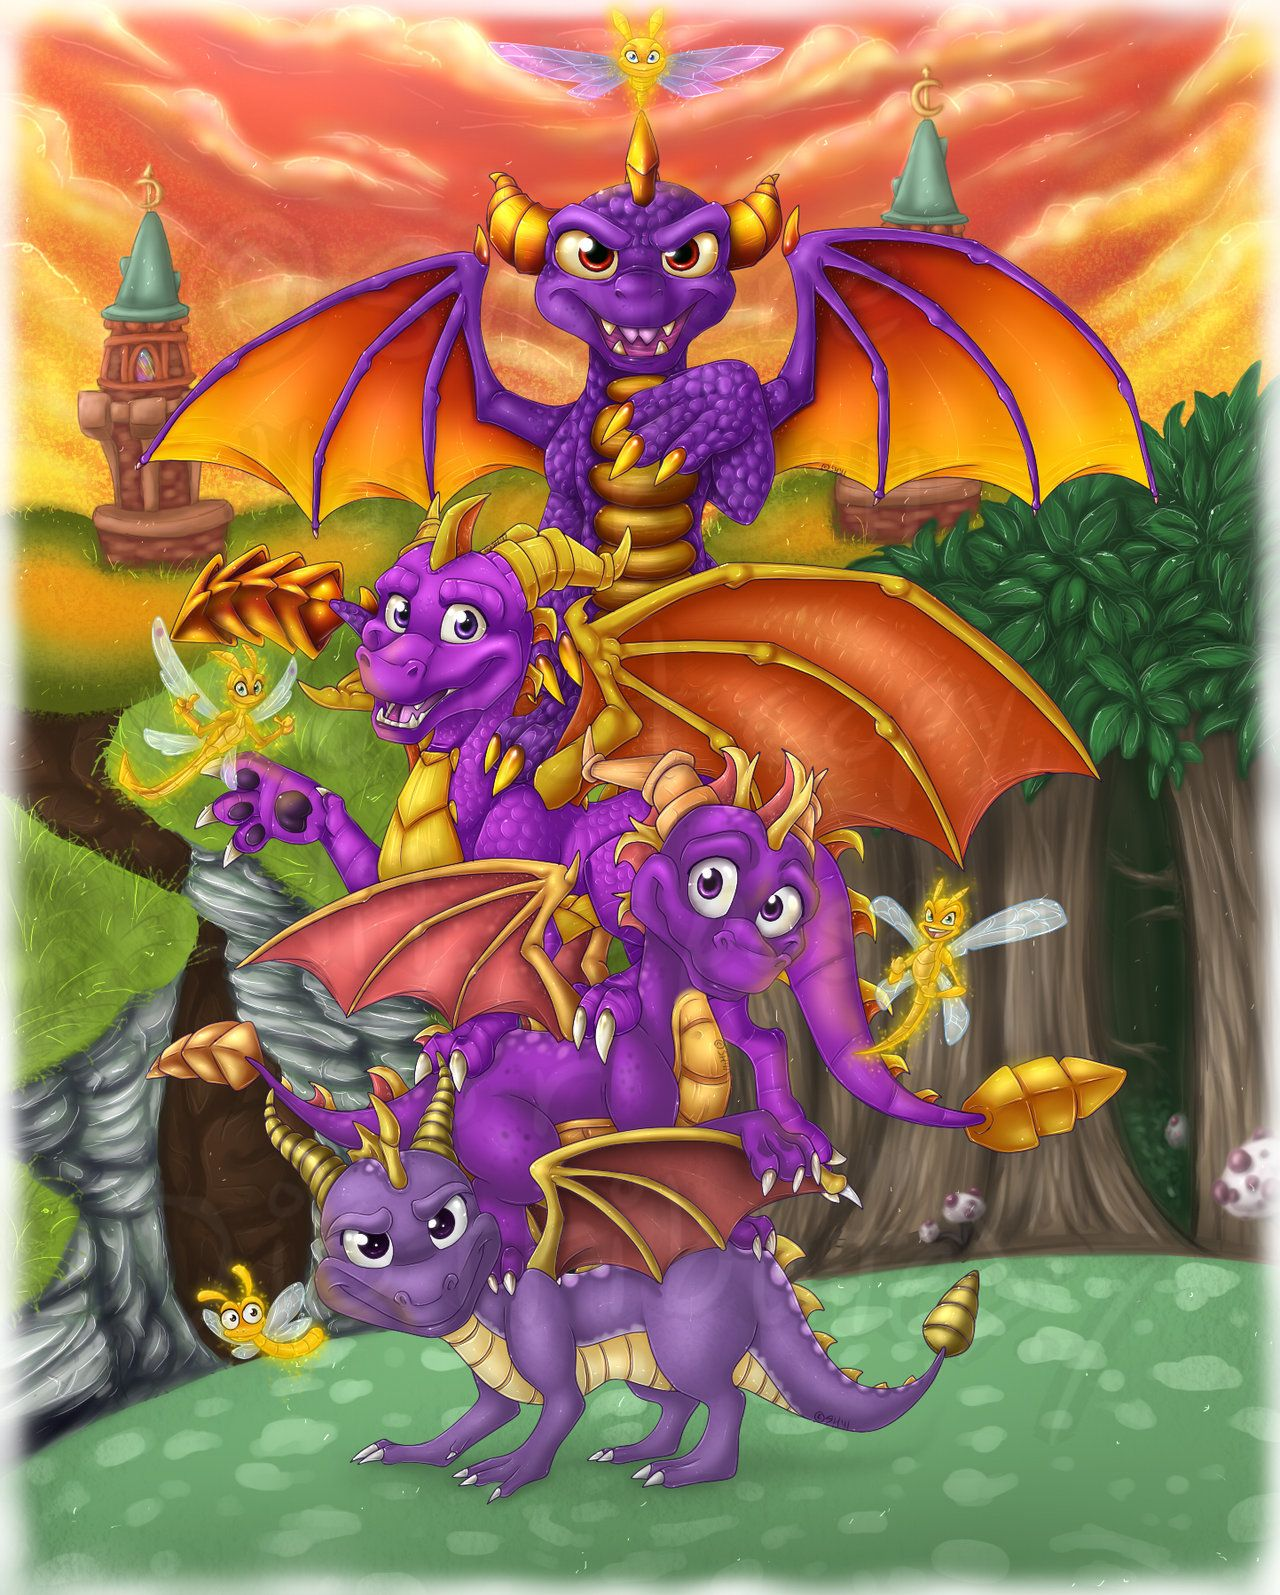 The purple little hero by shaloneSK Dragon artwork